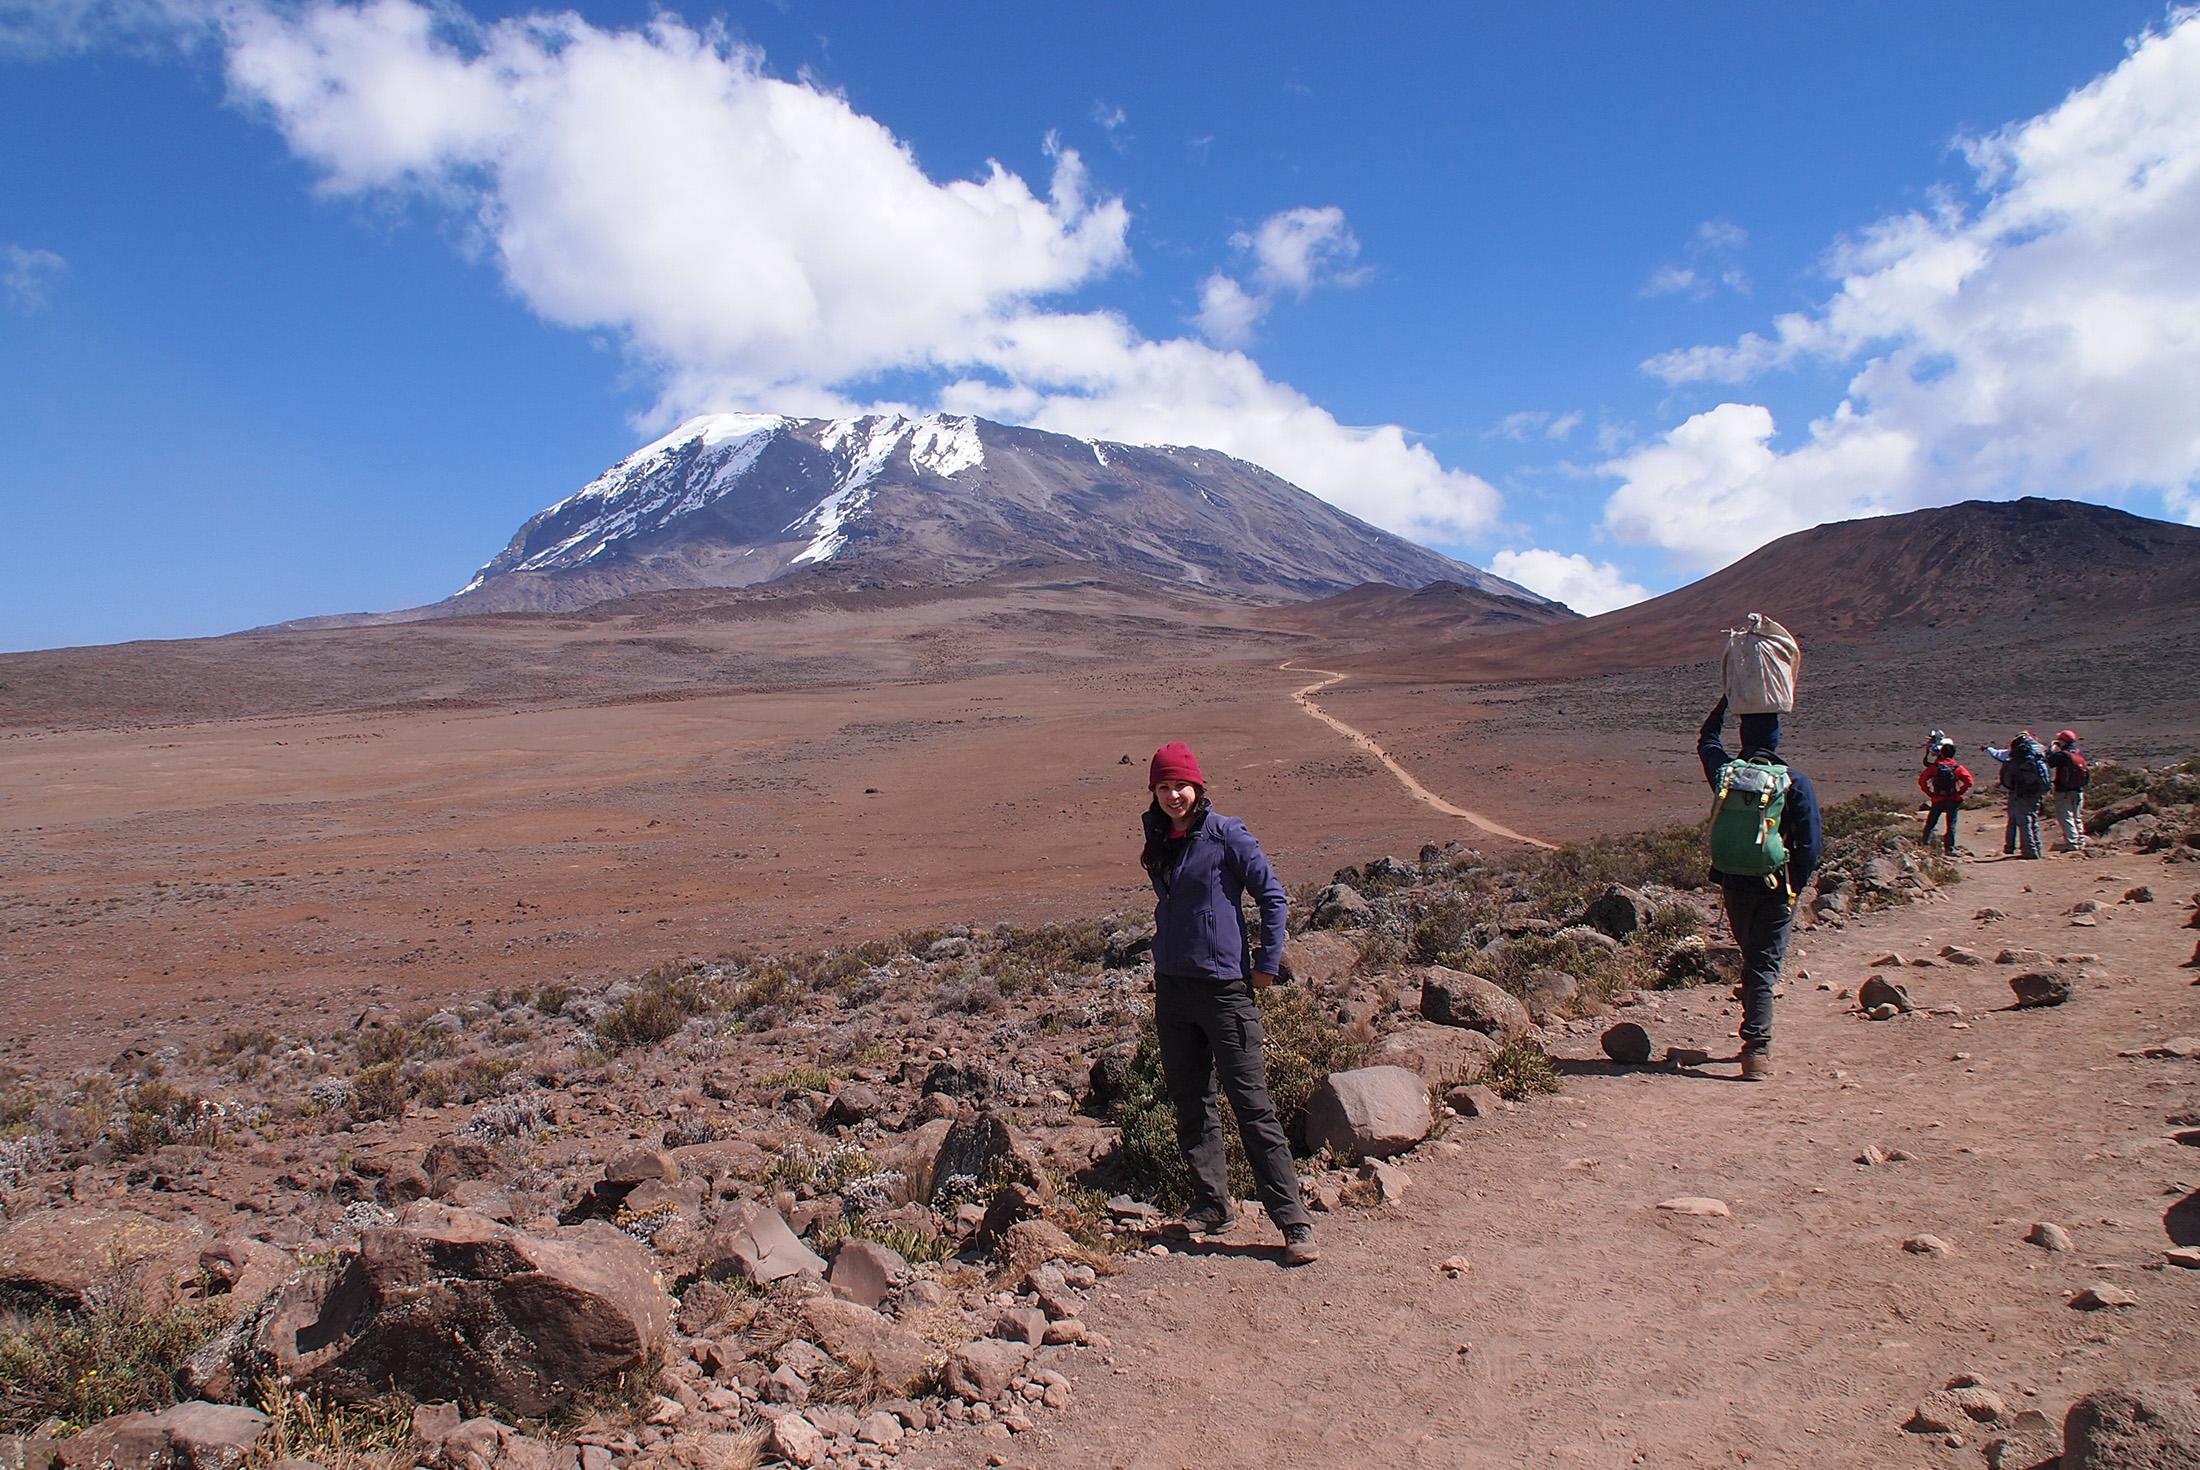 Mt Kilimanjaro Climb - Marangu Route 1